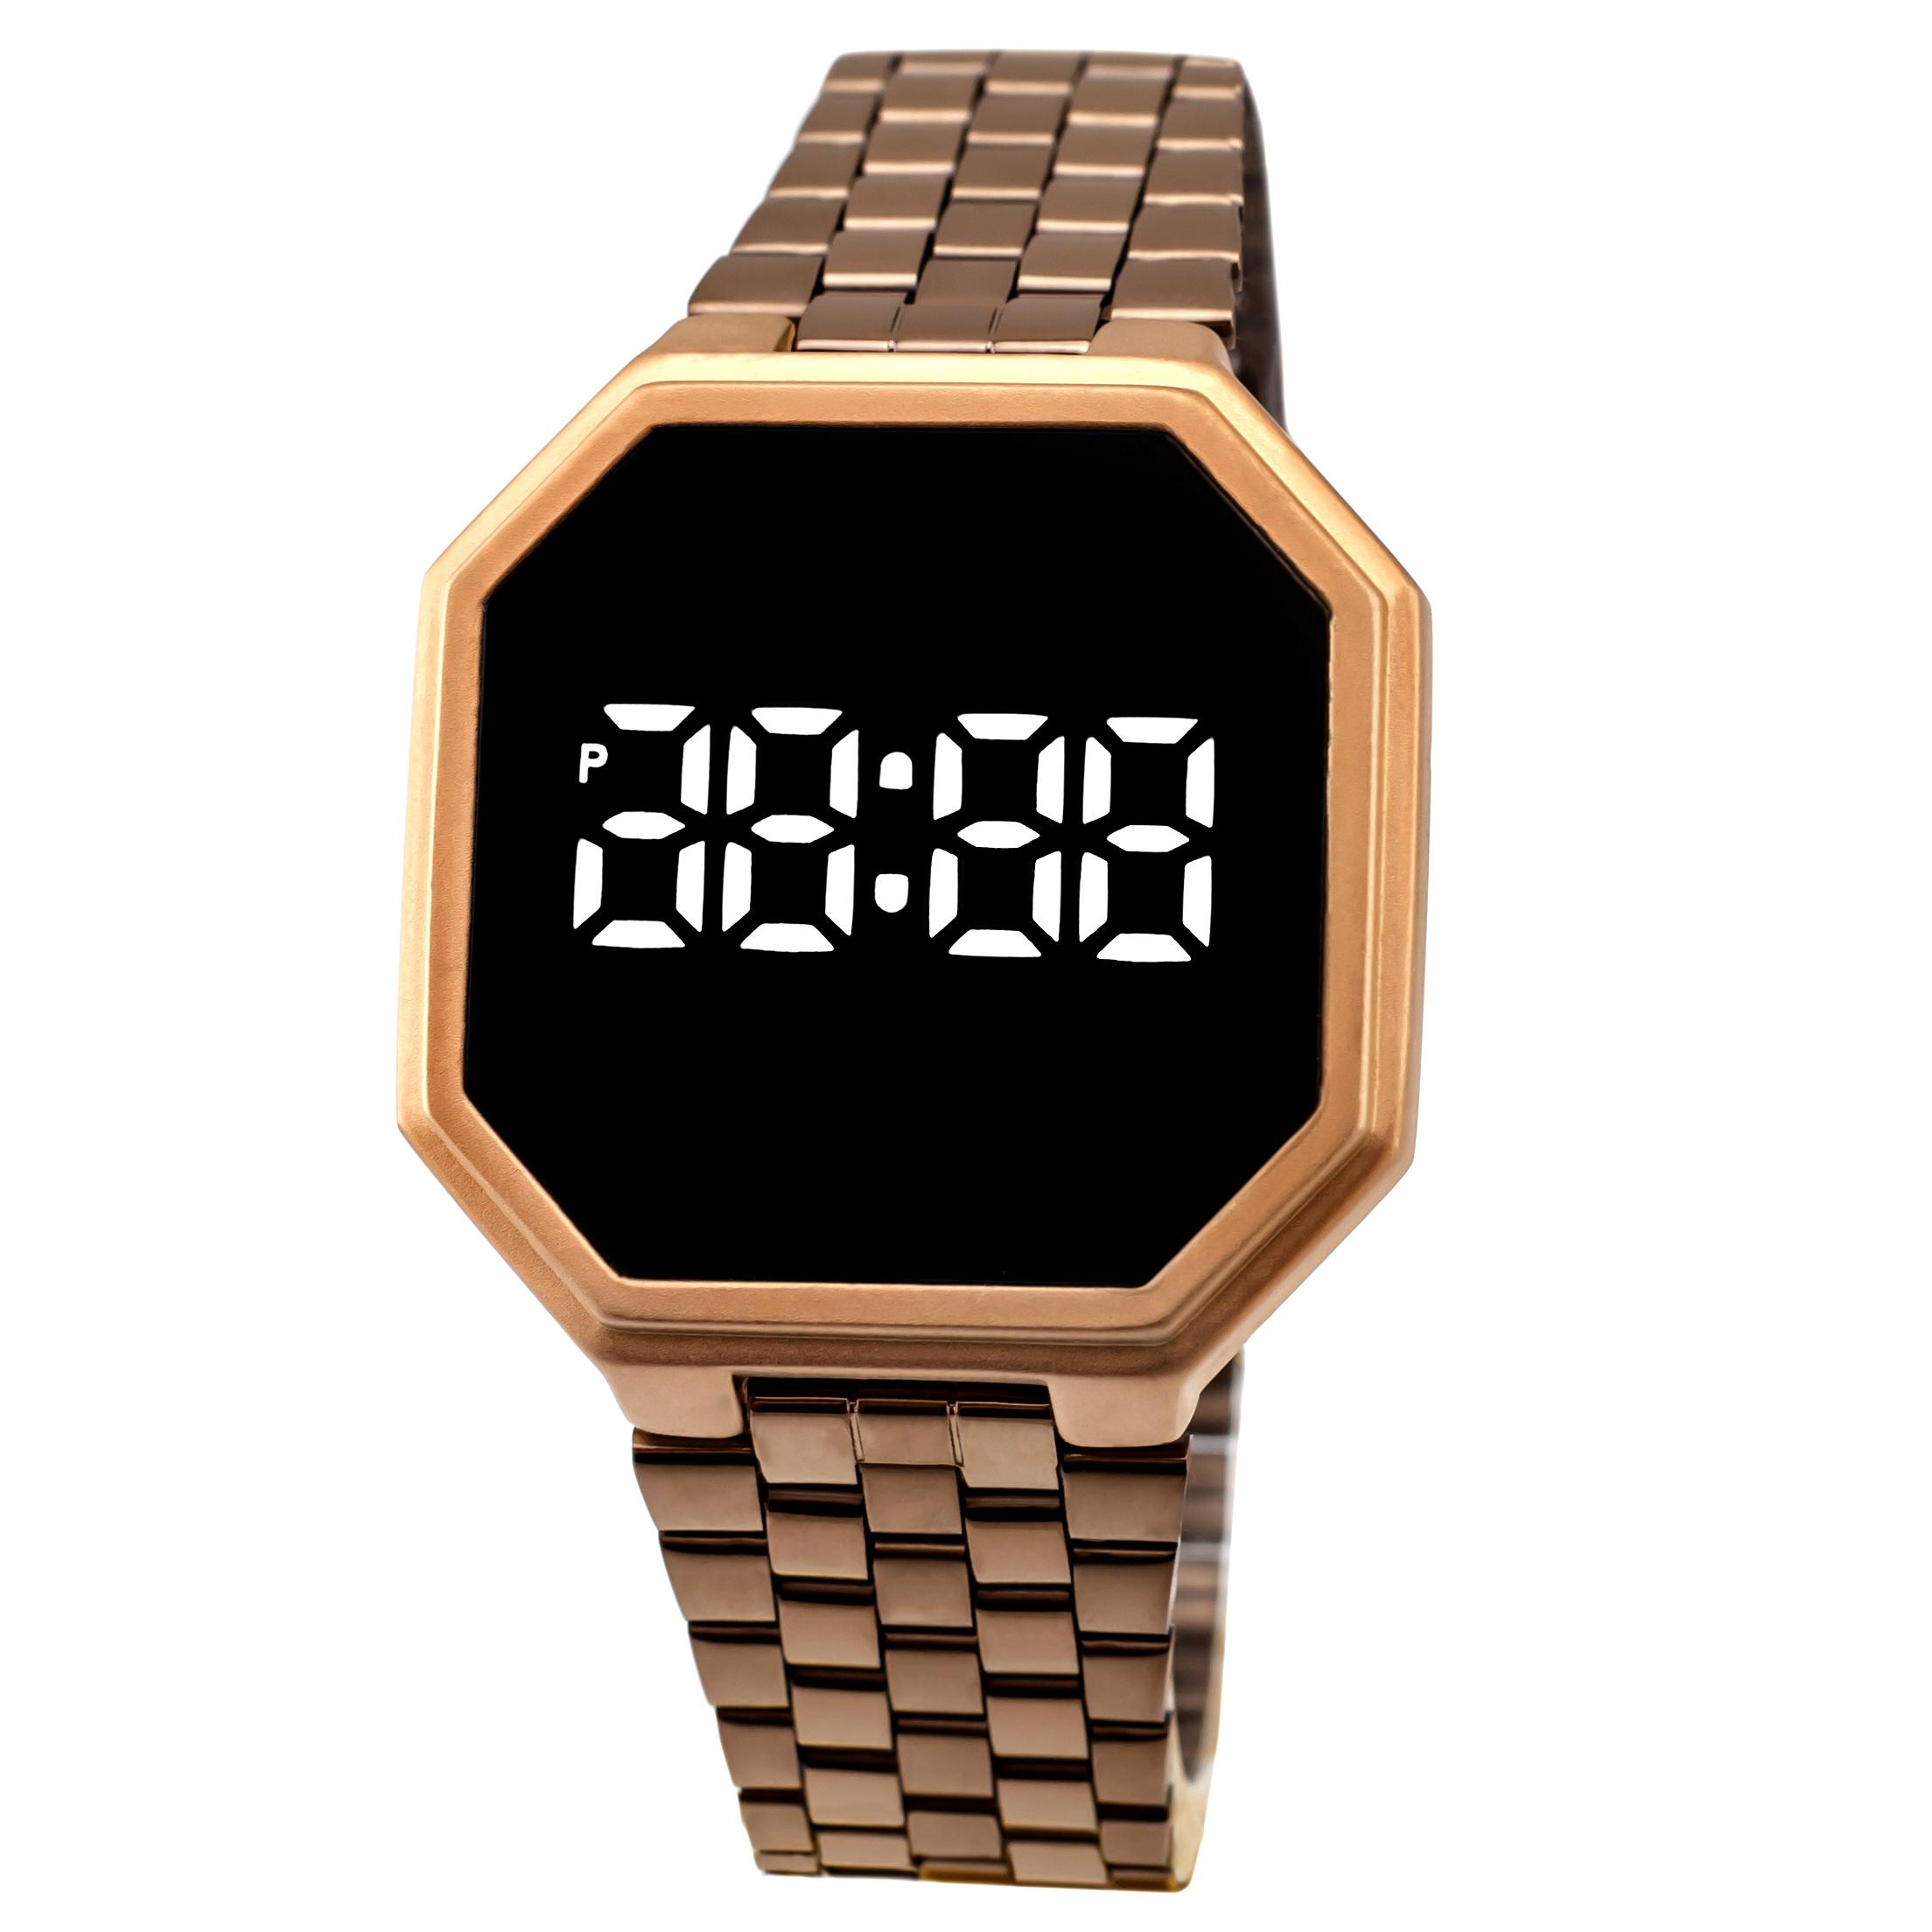 ساعت مچی دیجیتال مردانه مدل001 BR